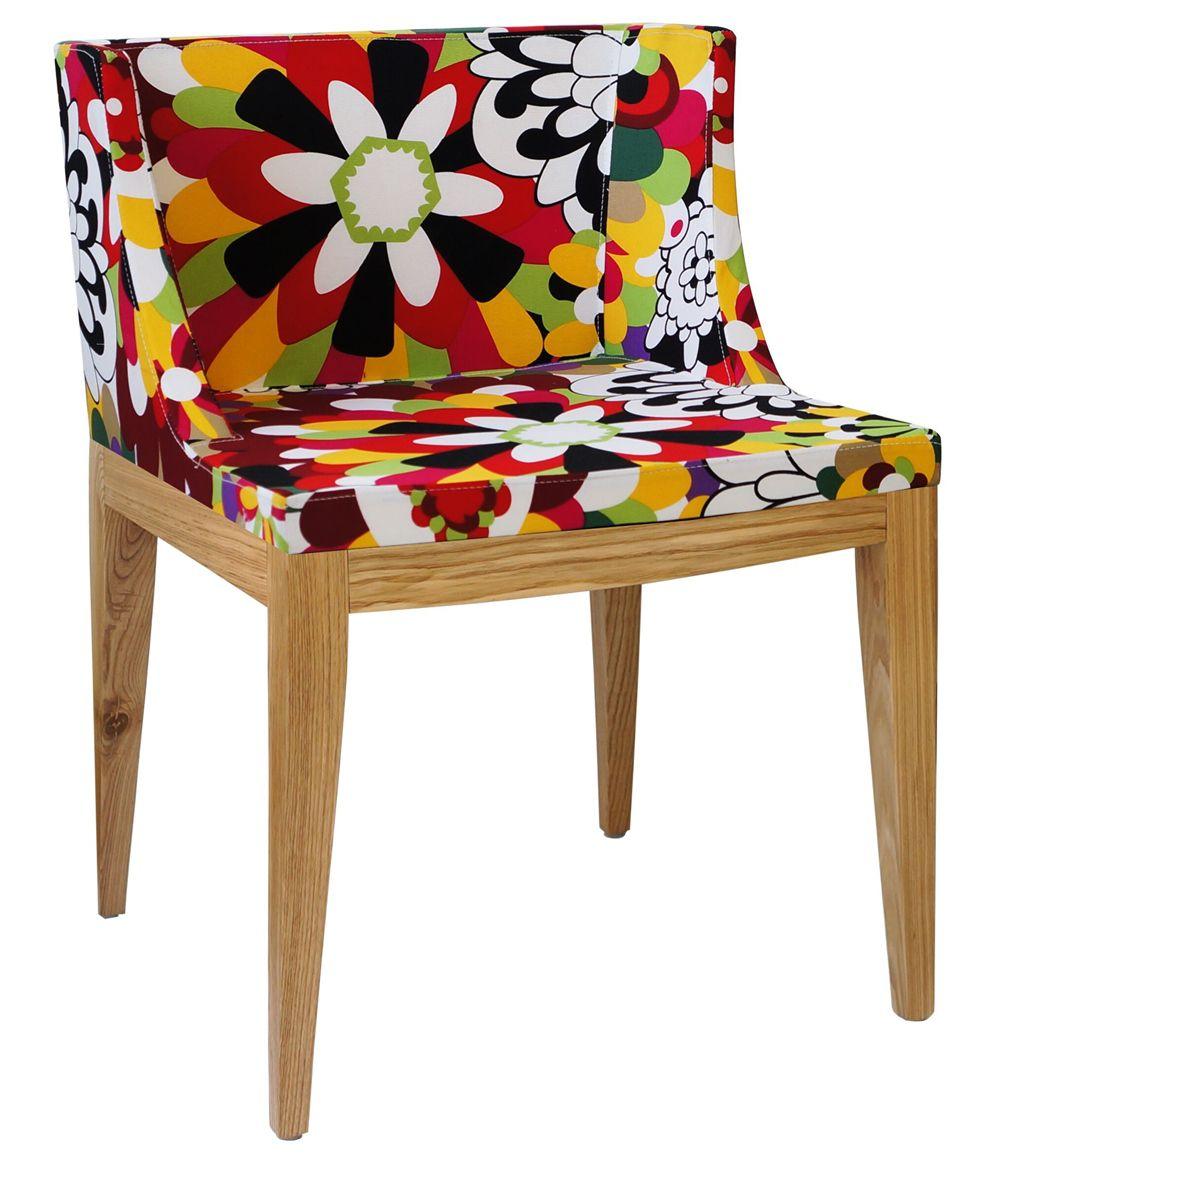 Cadeira Mademoiselle Senhorita Christie Base em Madeira Clara